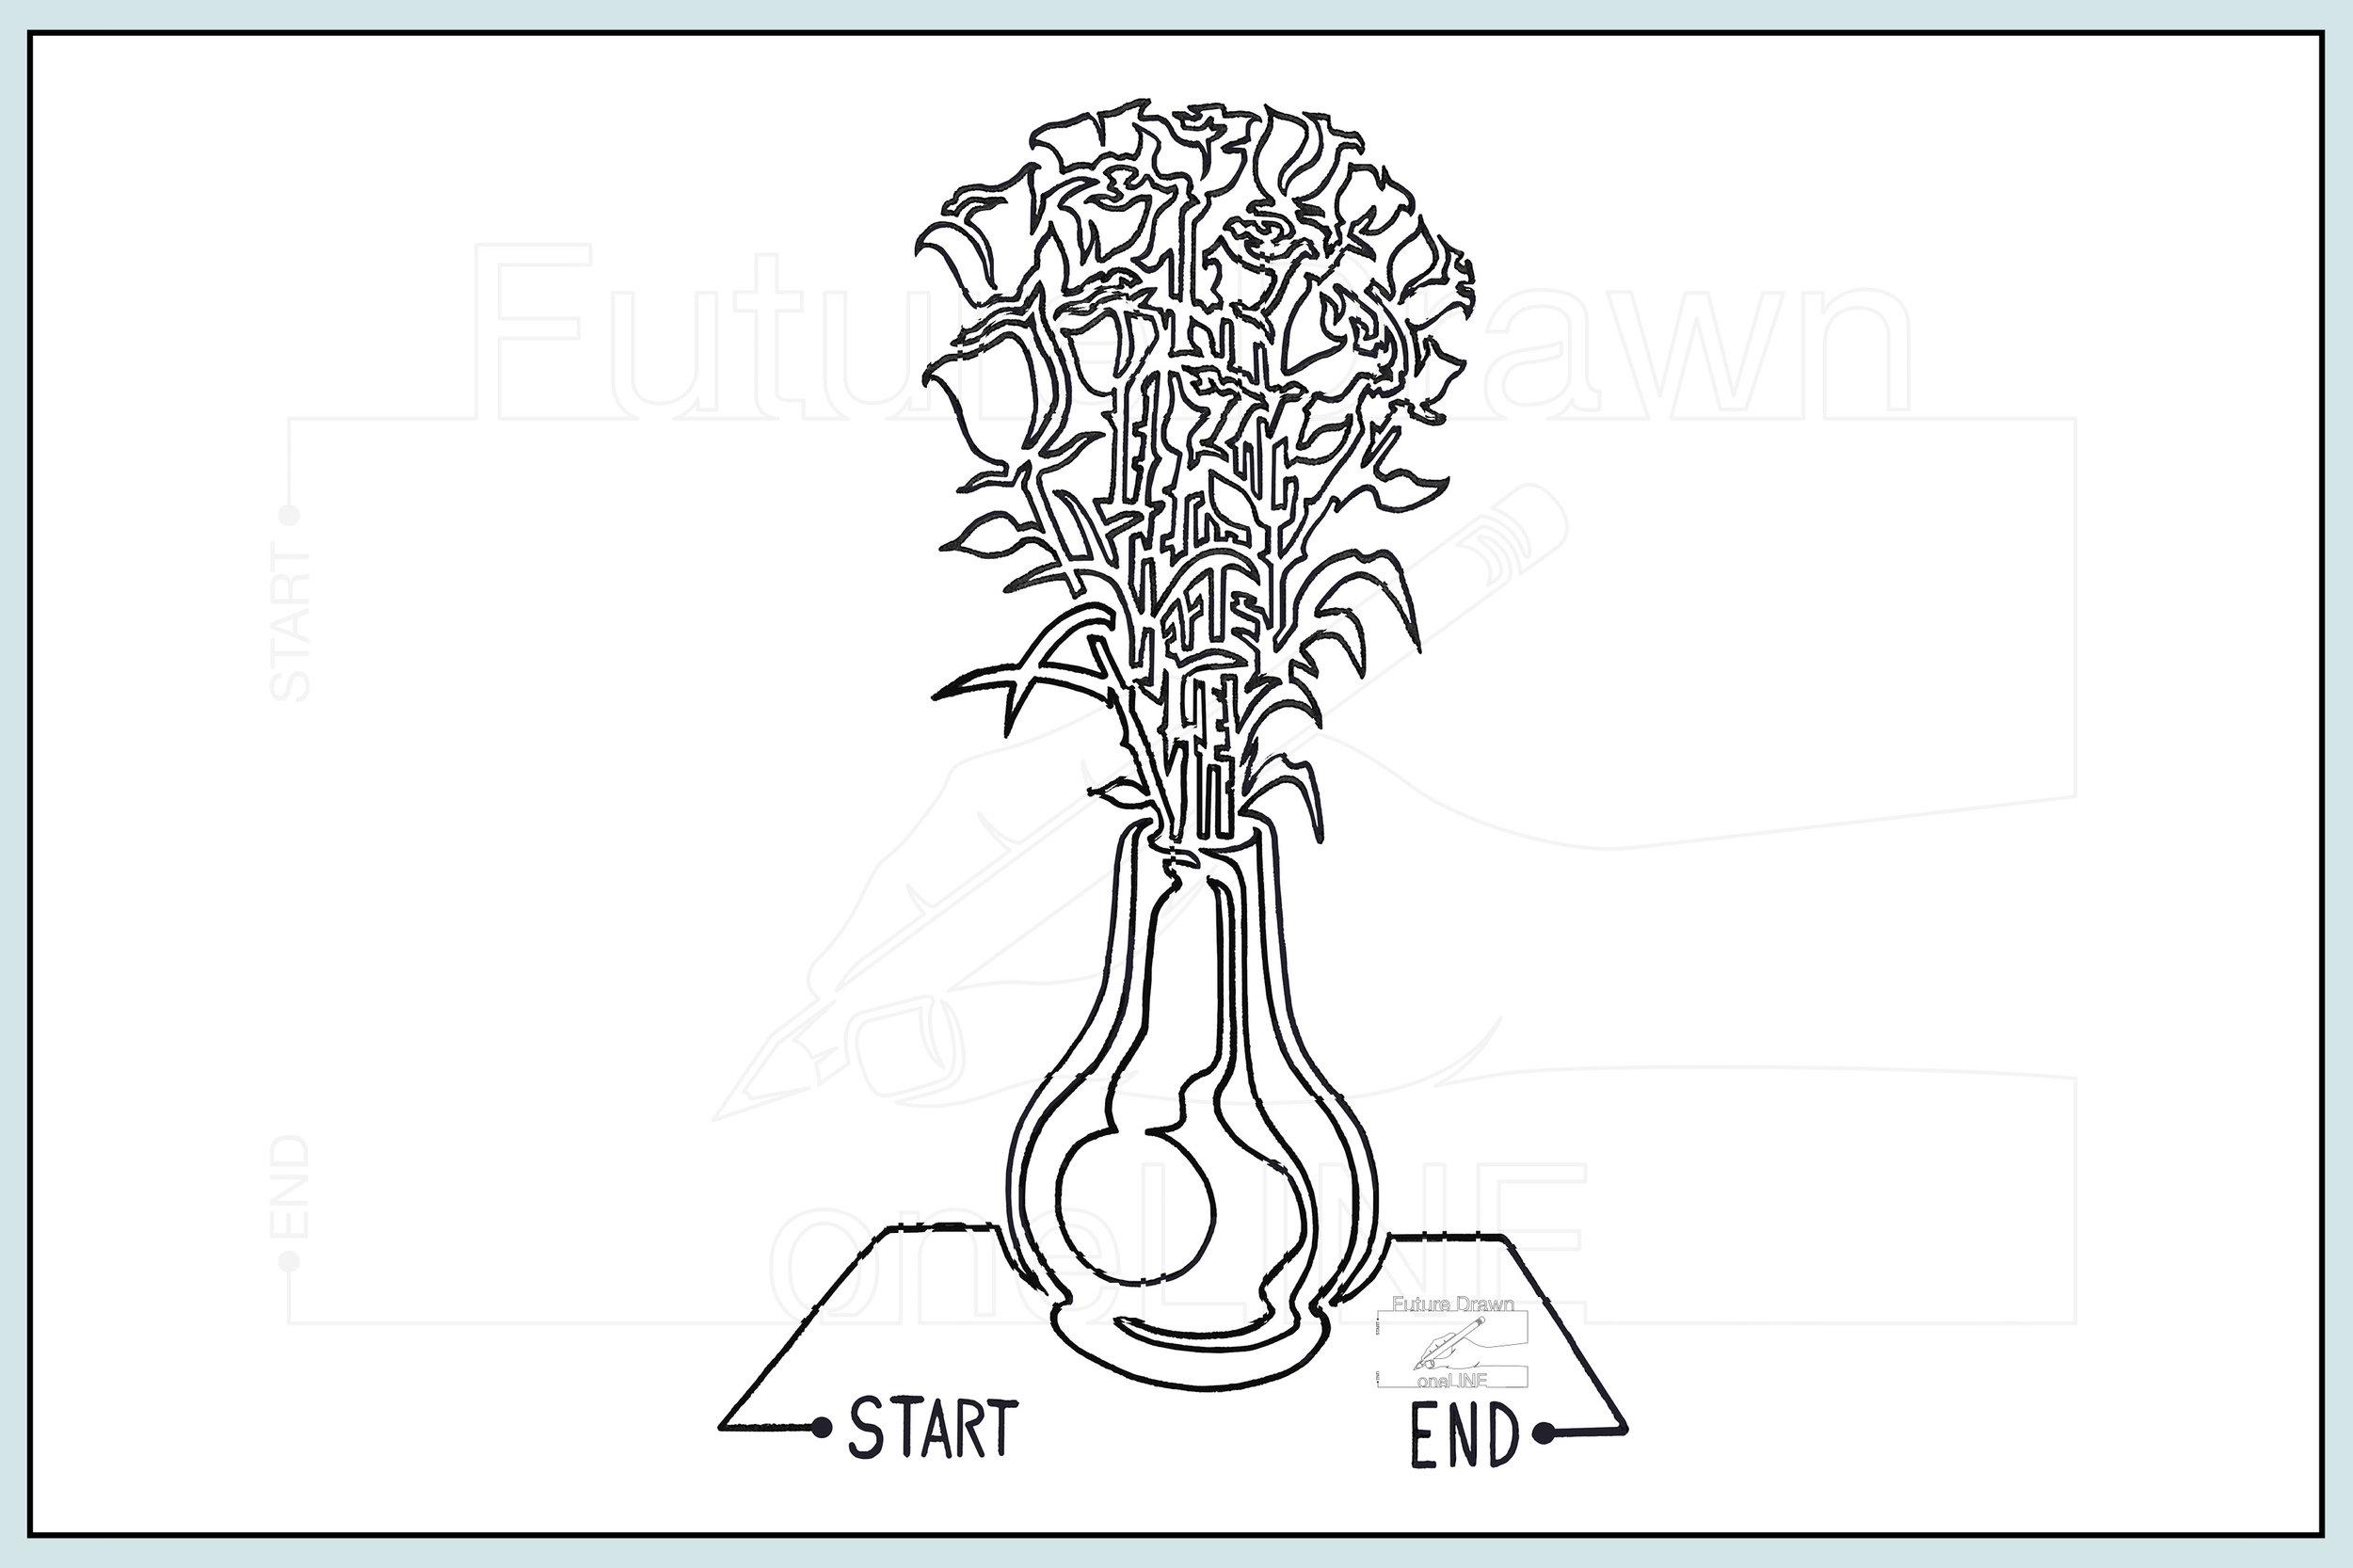 Web- one Small Vasse of roses- oneLINE Future Drawn Applegate.jpg